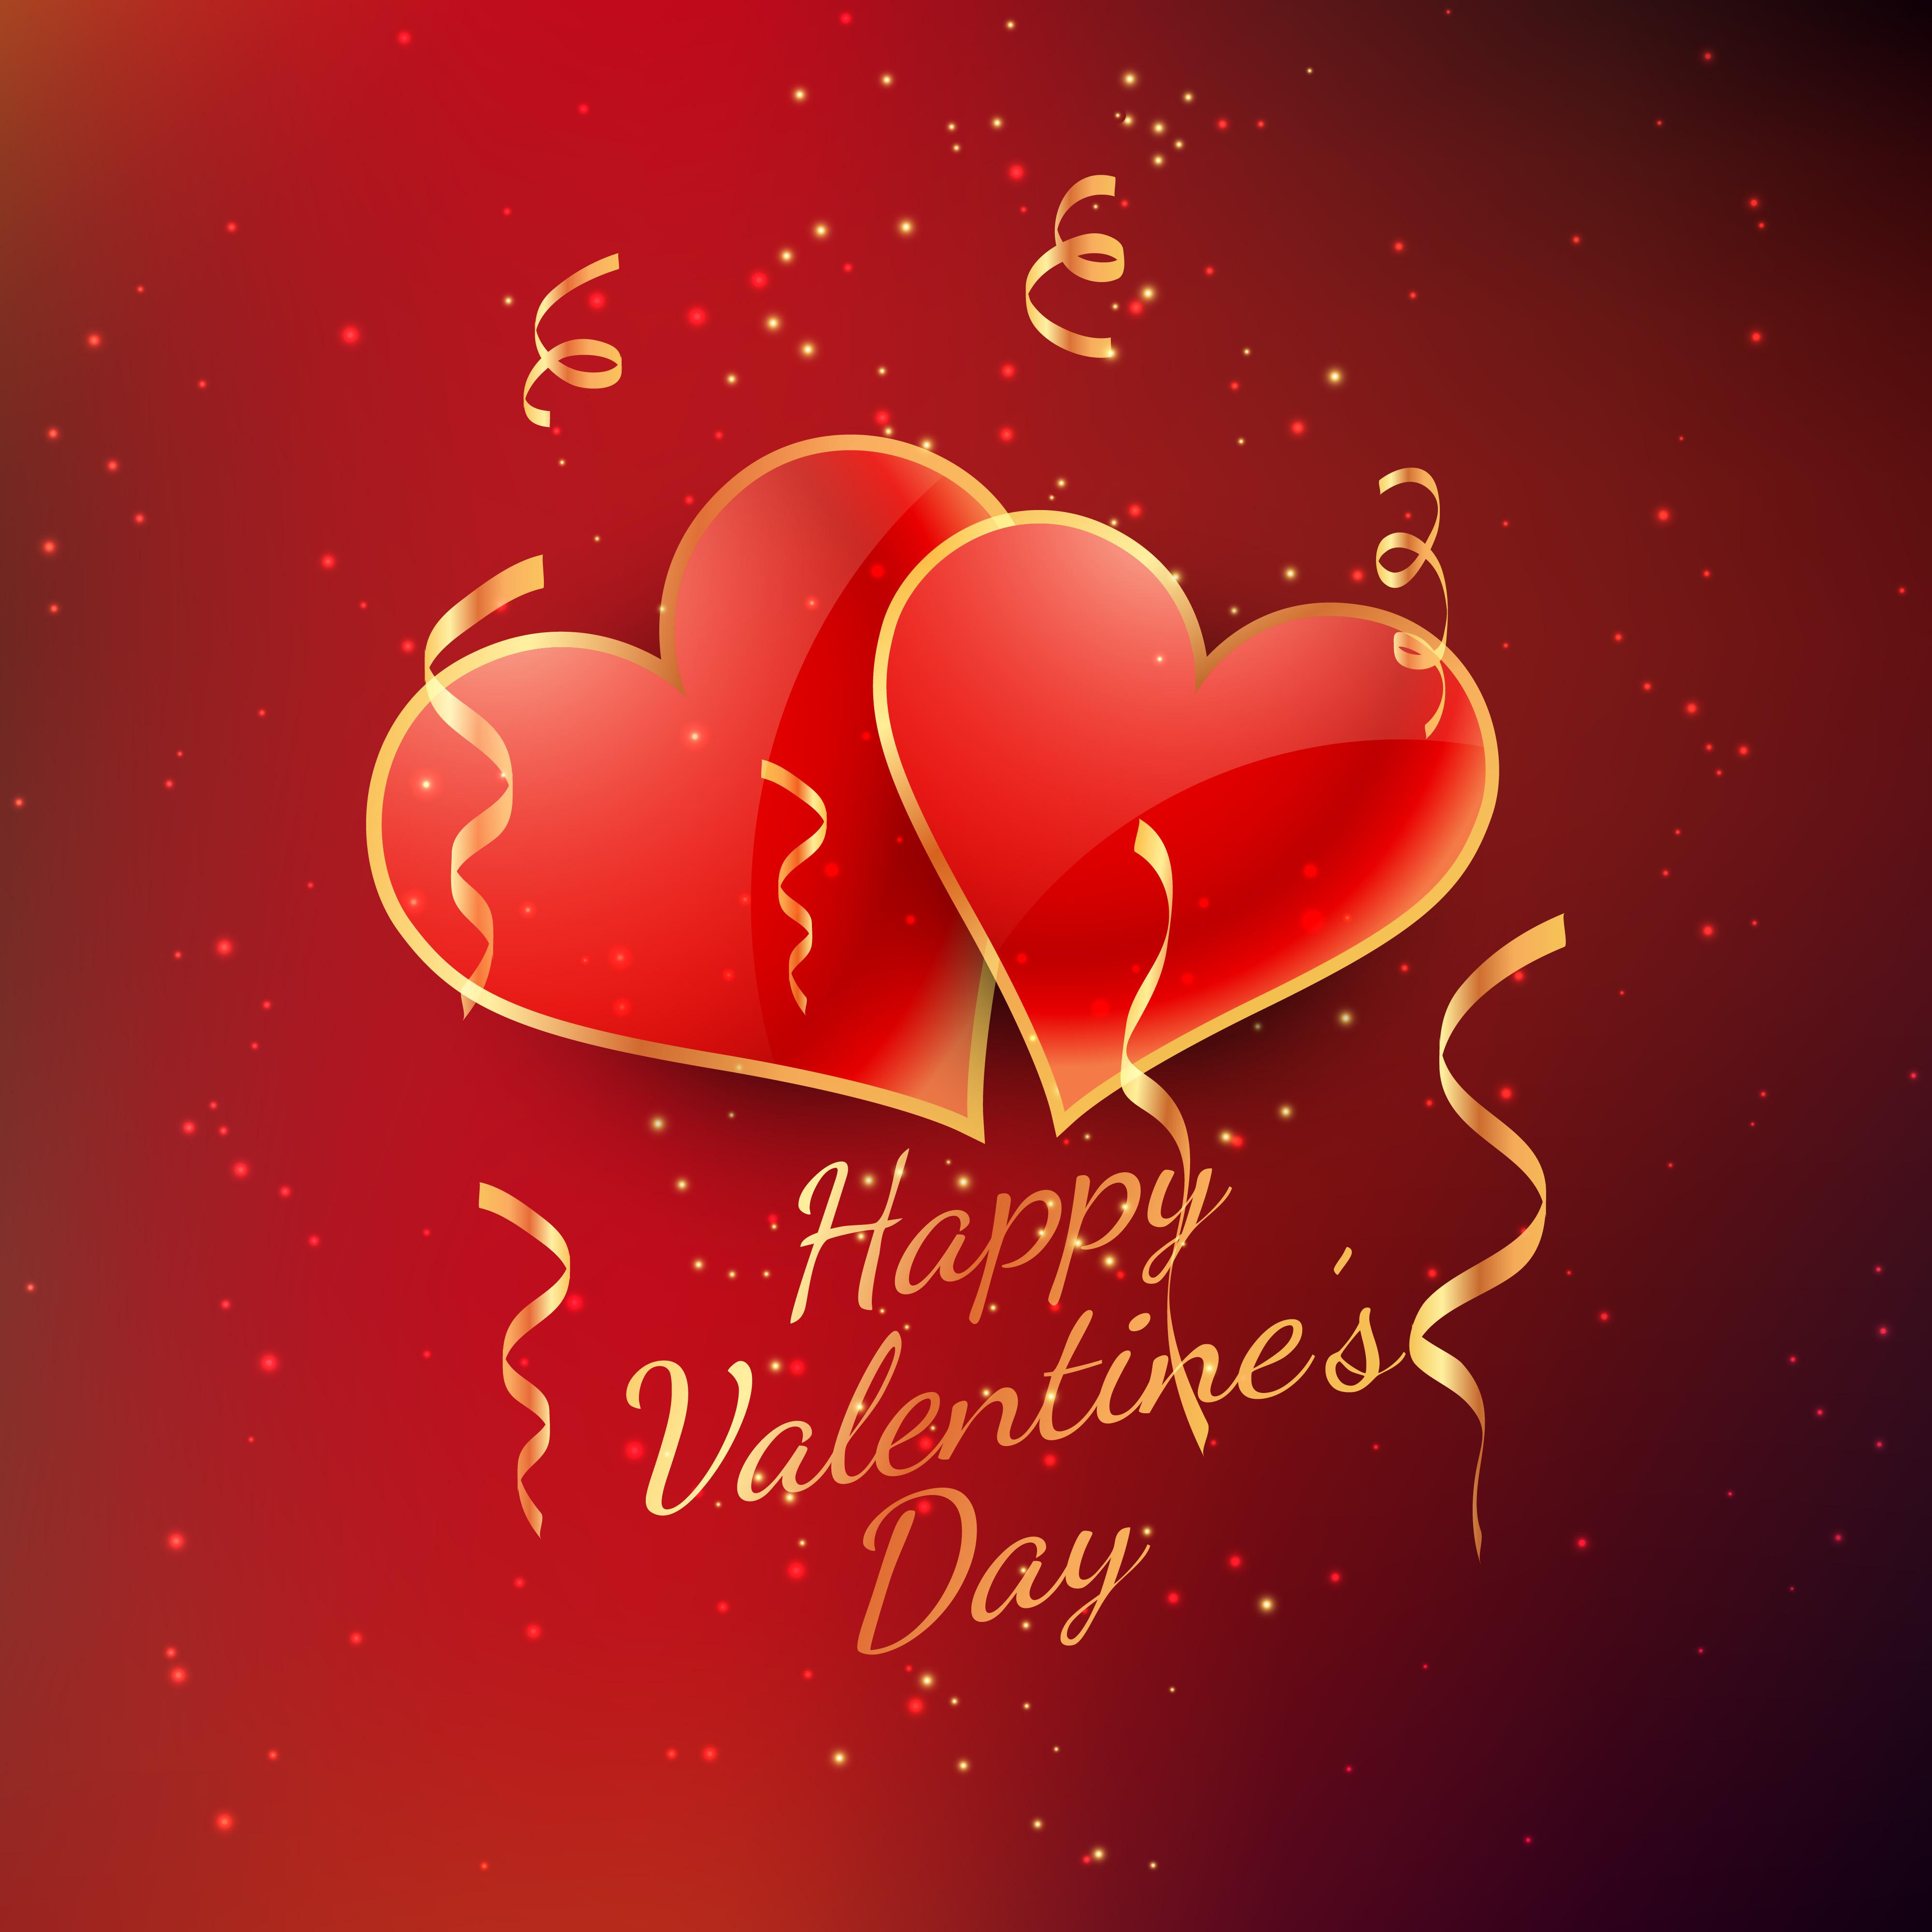 Valentine Day: Valentines Day Celebration Card Vector Design Illustration